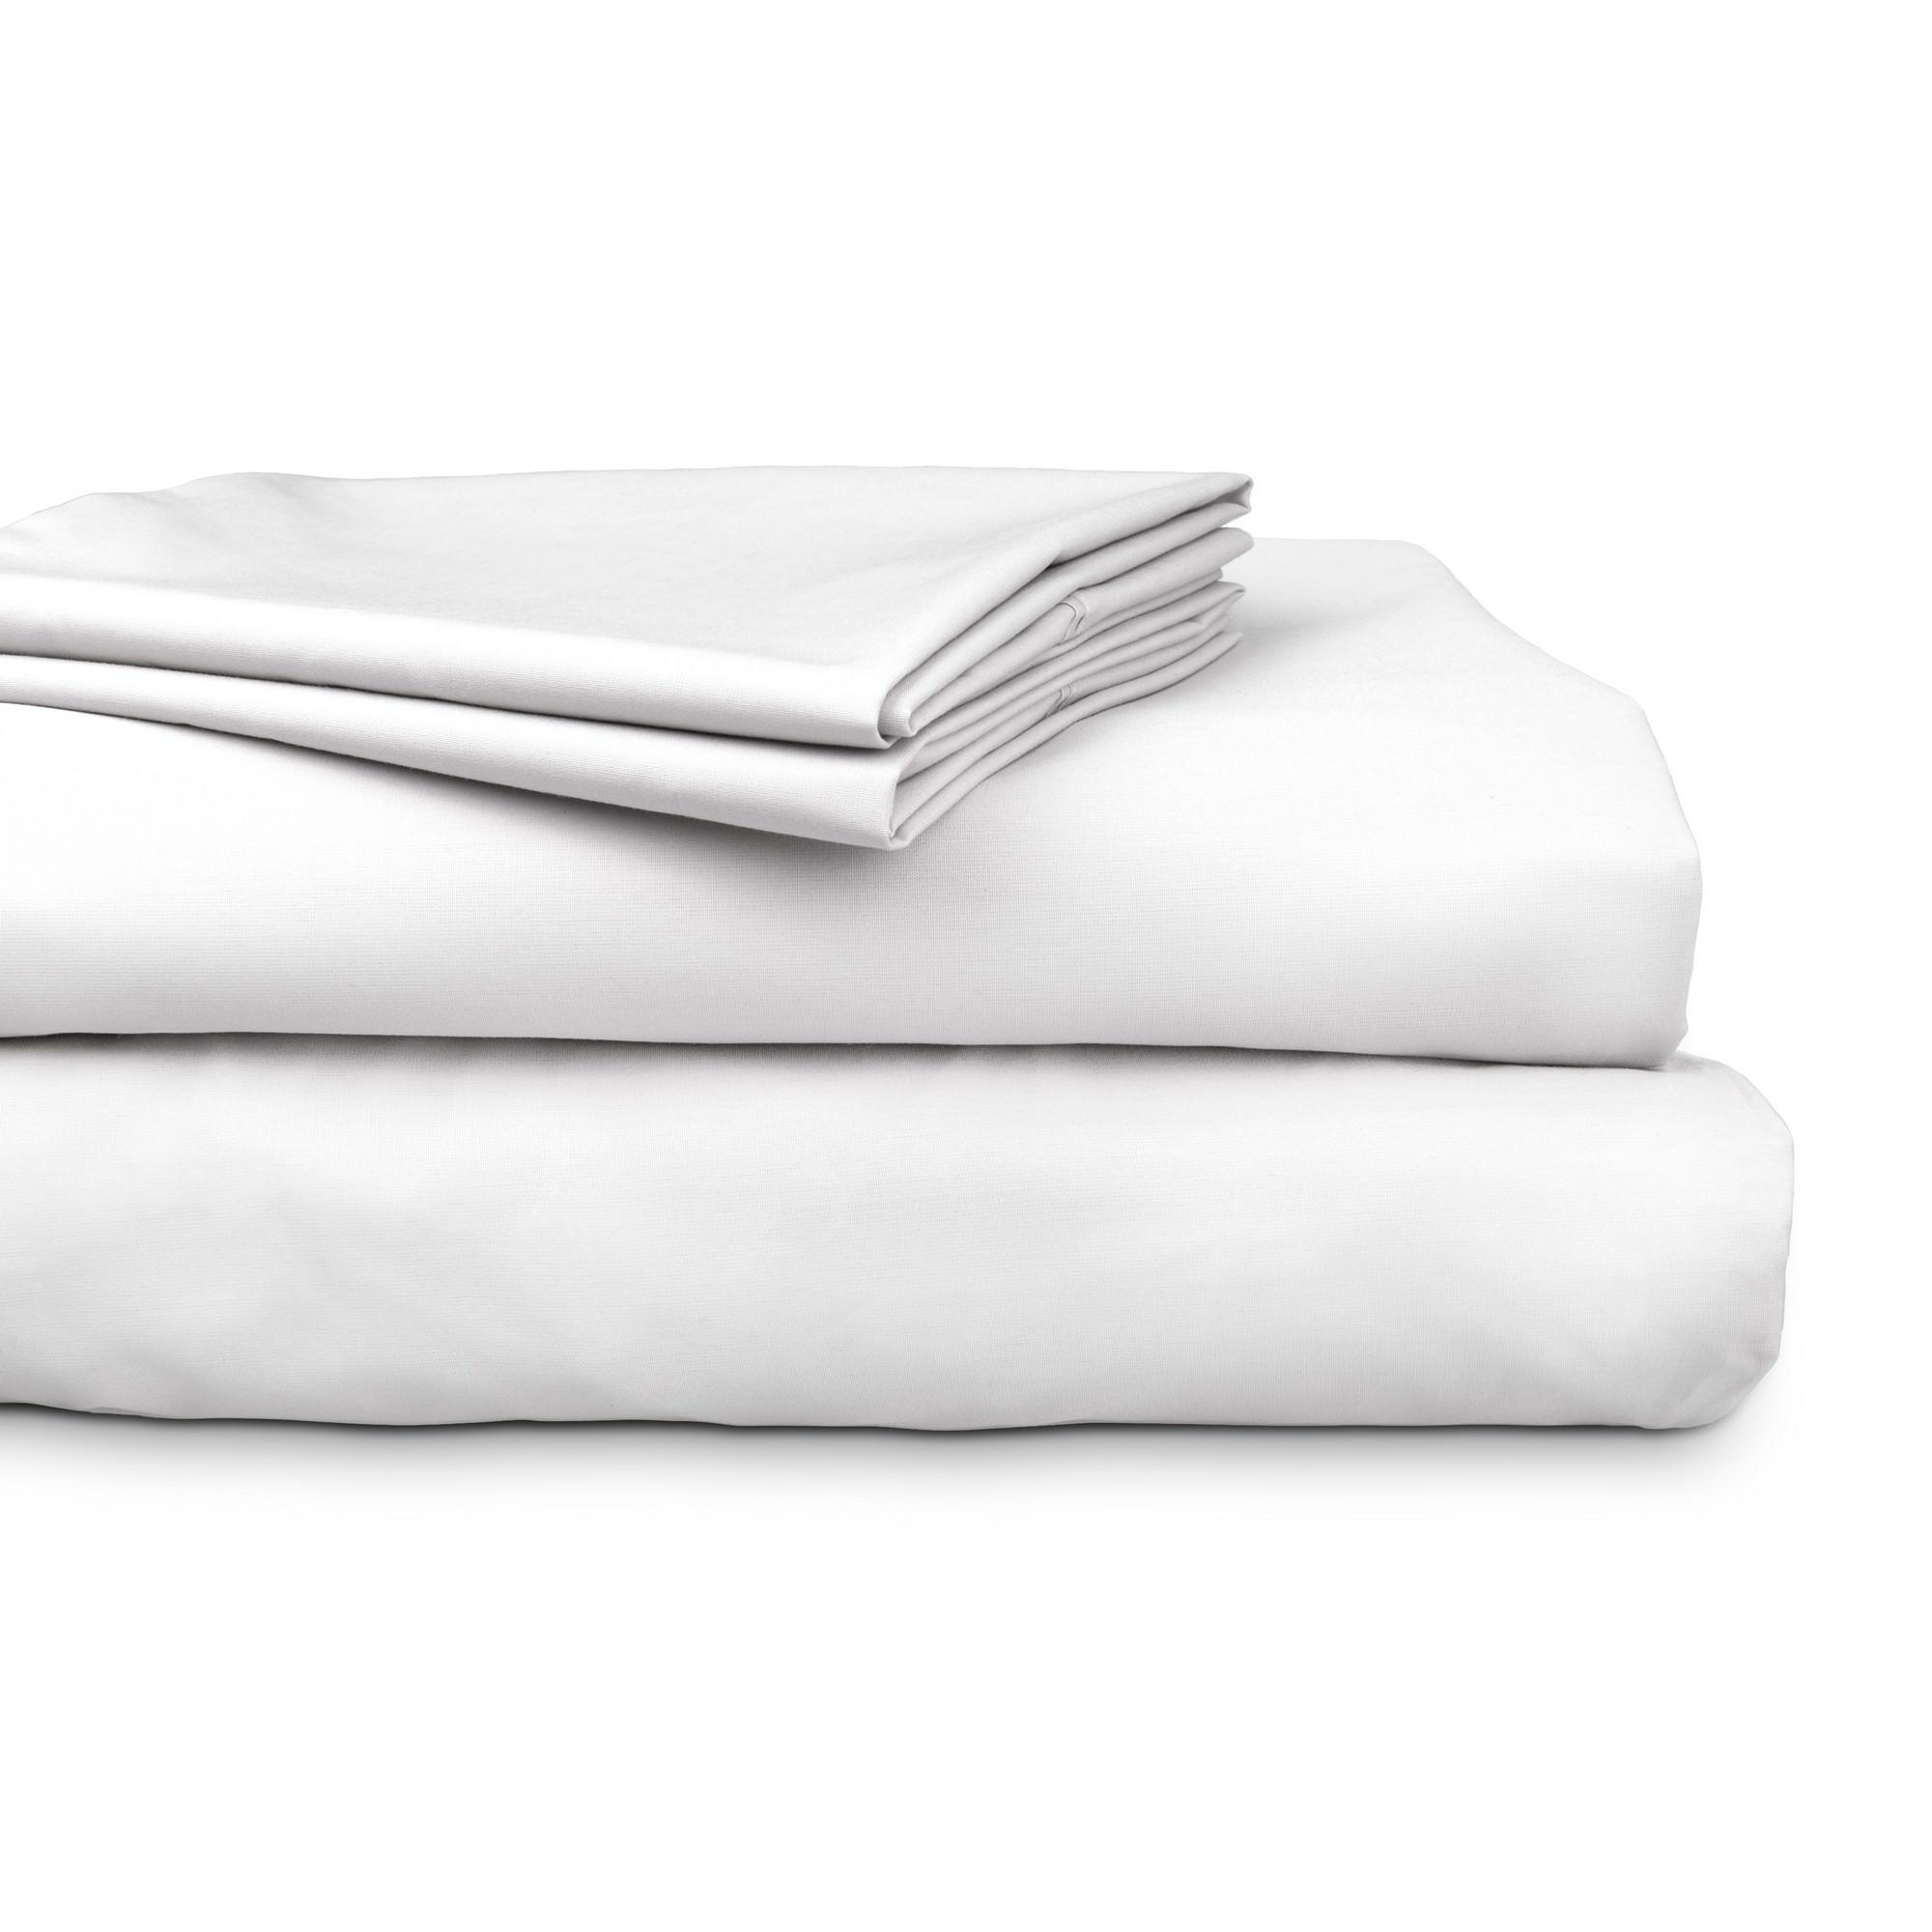 Ajee 4 Piece 300TC Cotton Sheet Set, King, White